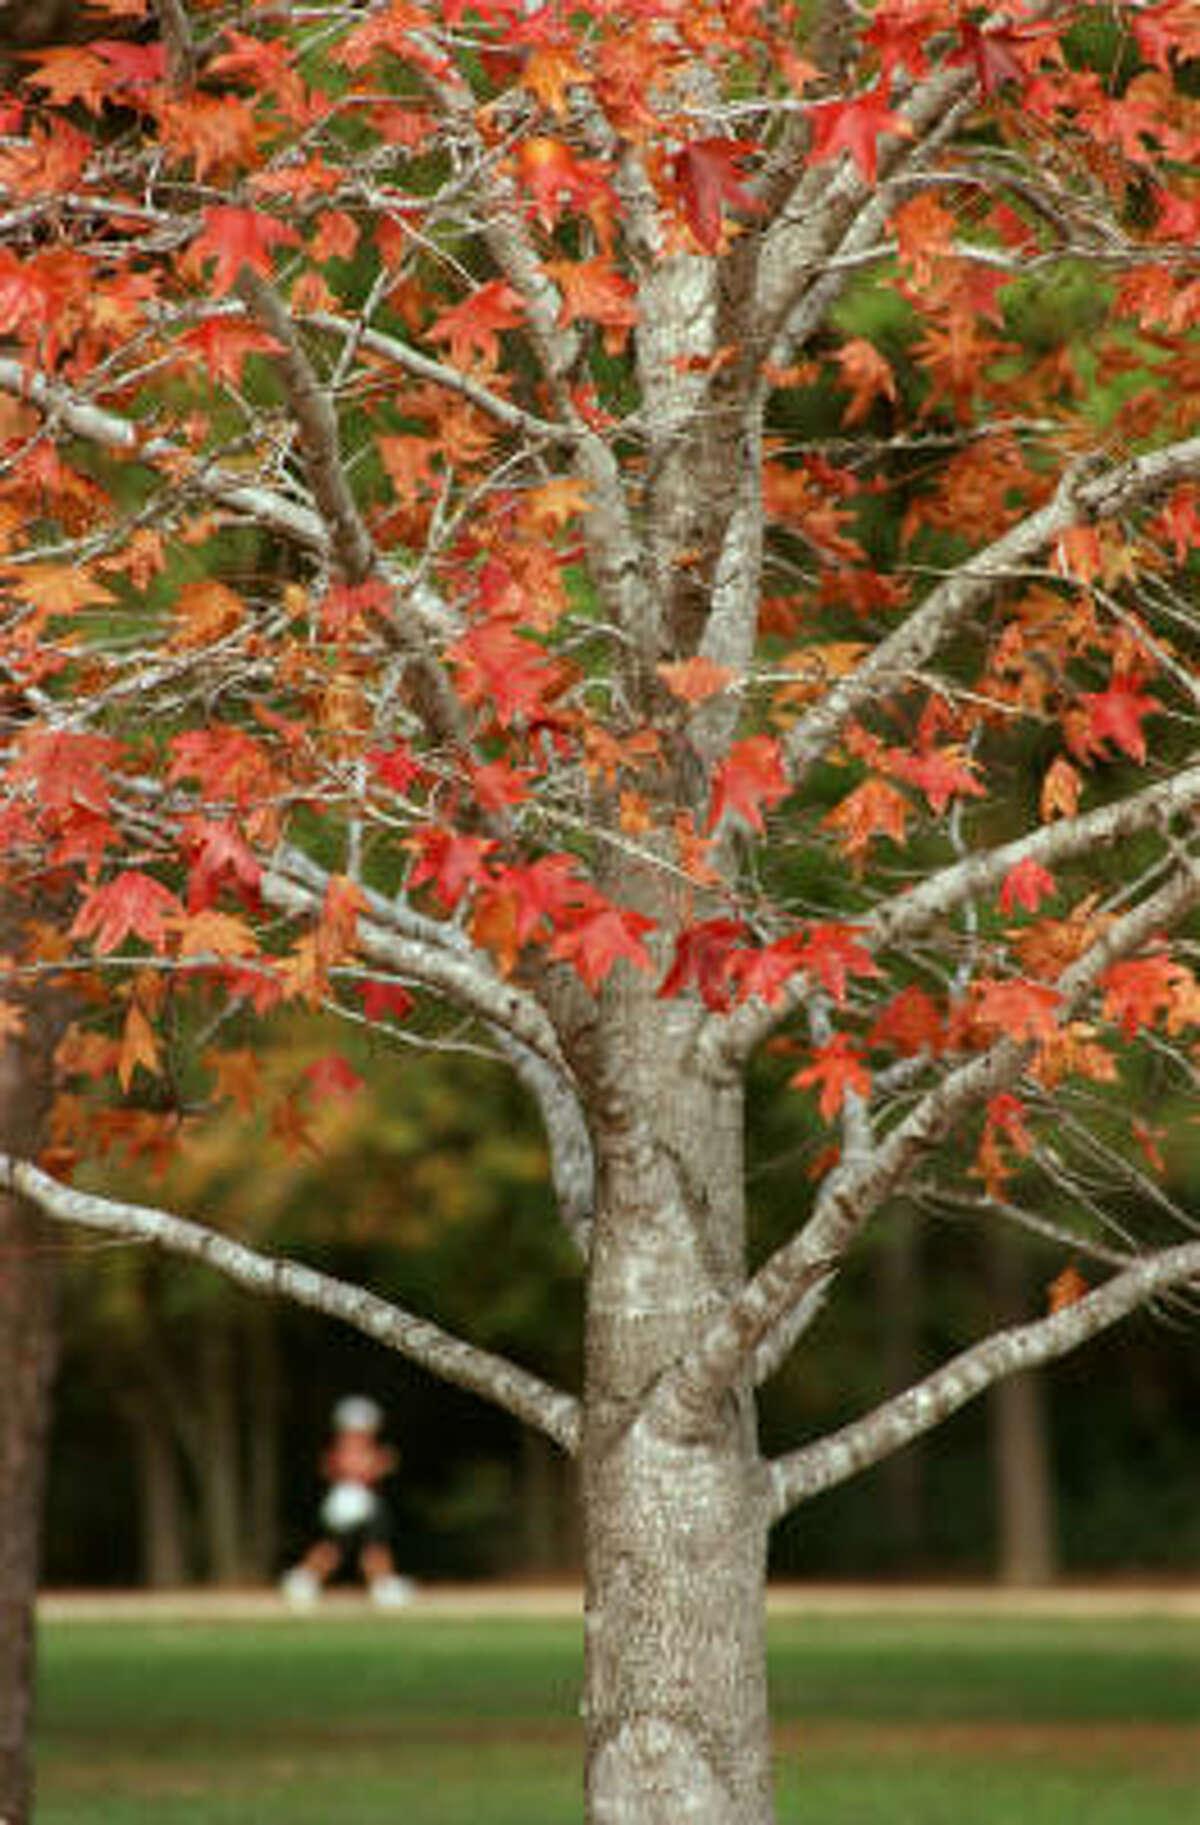 Sweet gum's bright reds and oranges in Memorial Park.